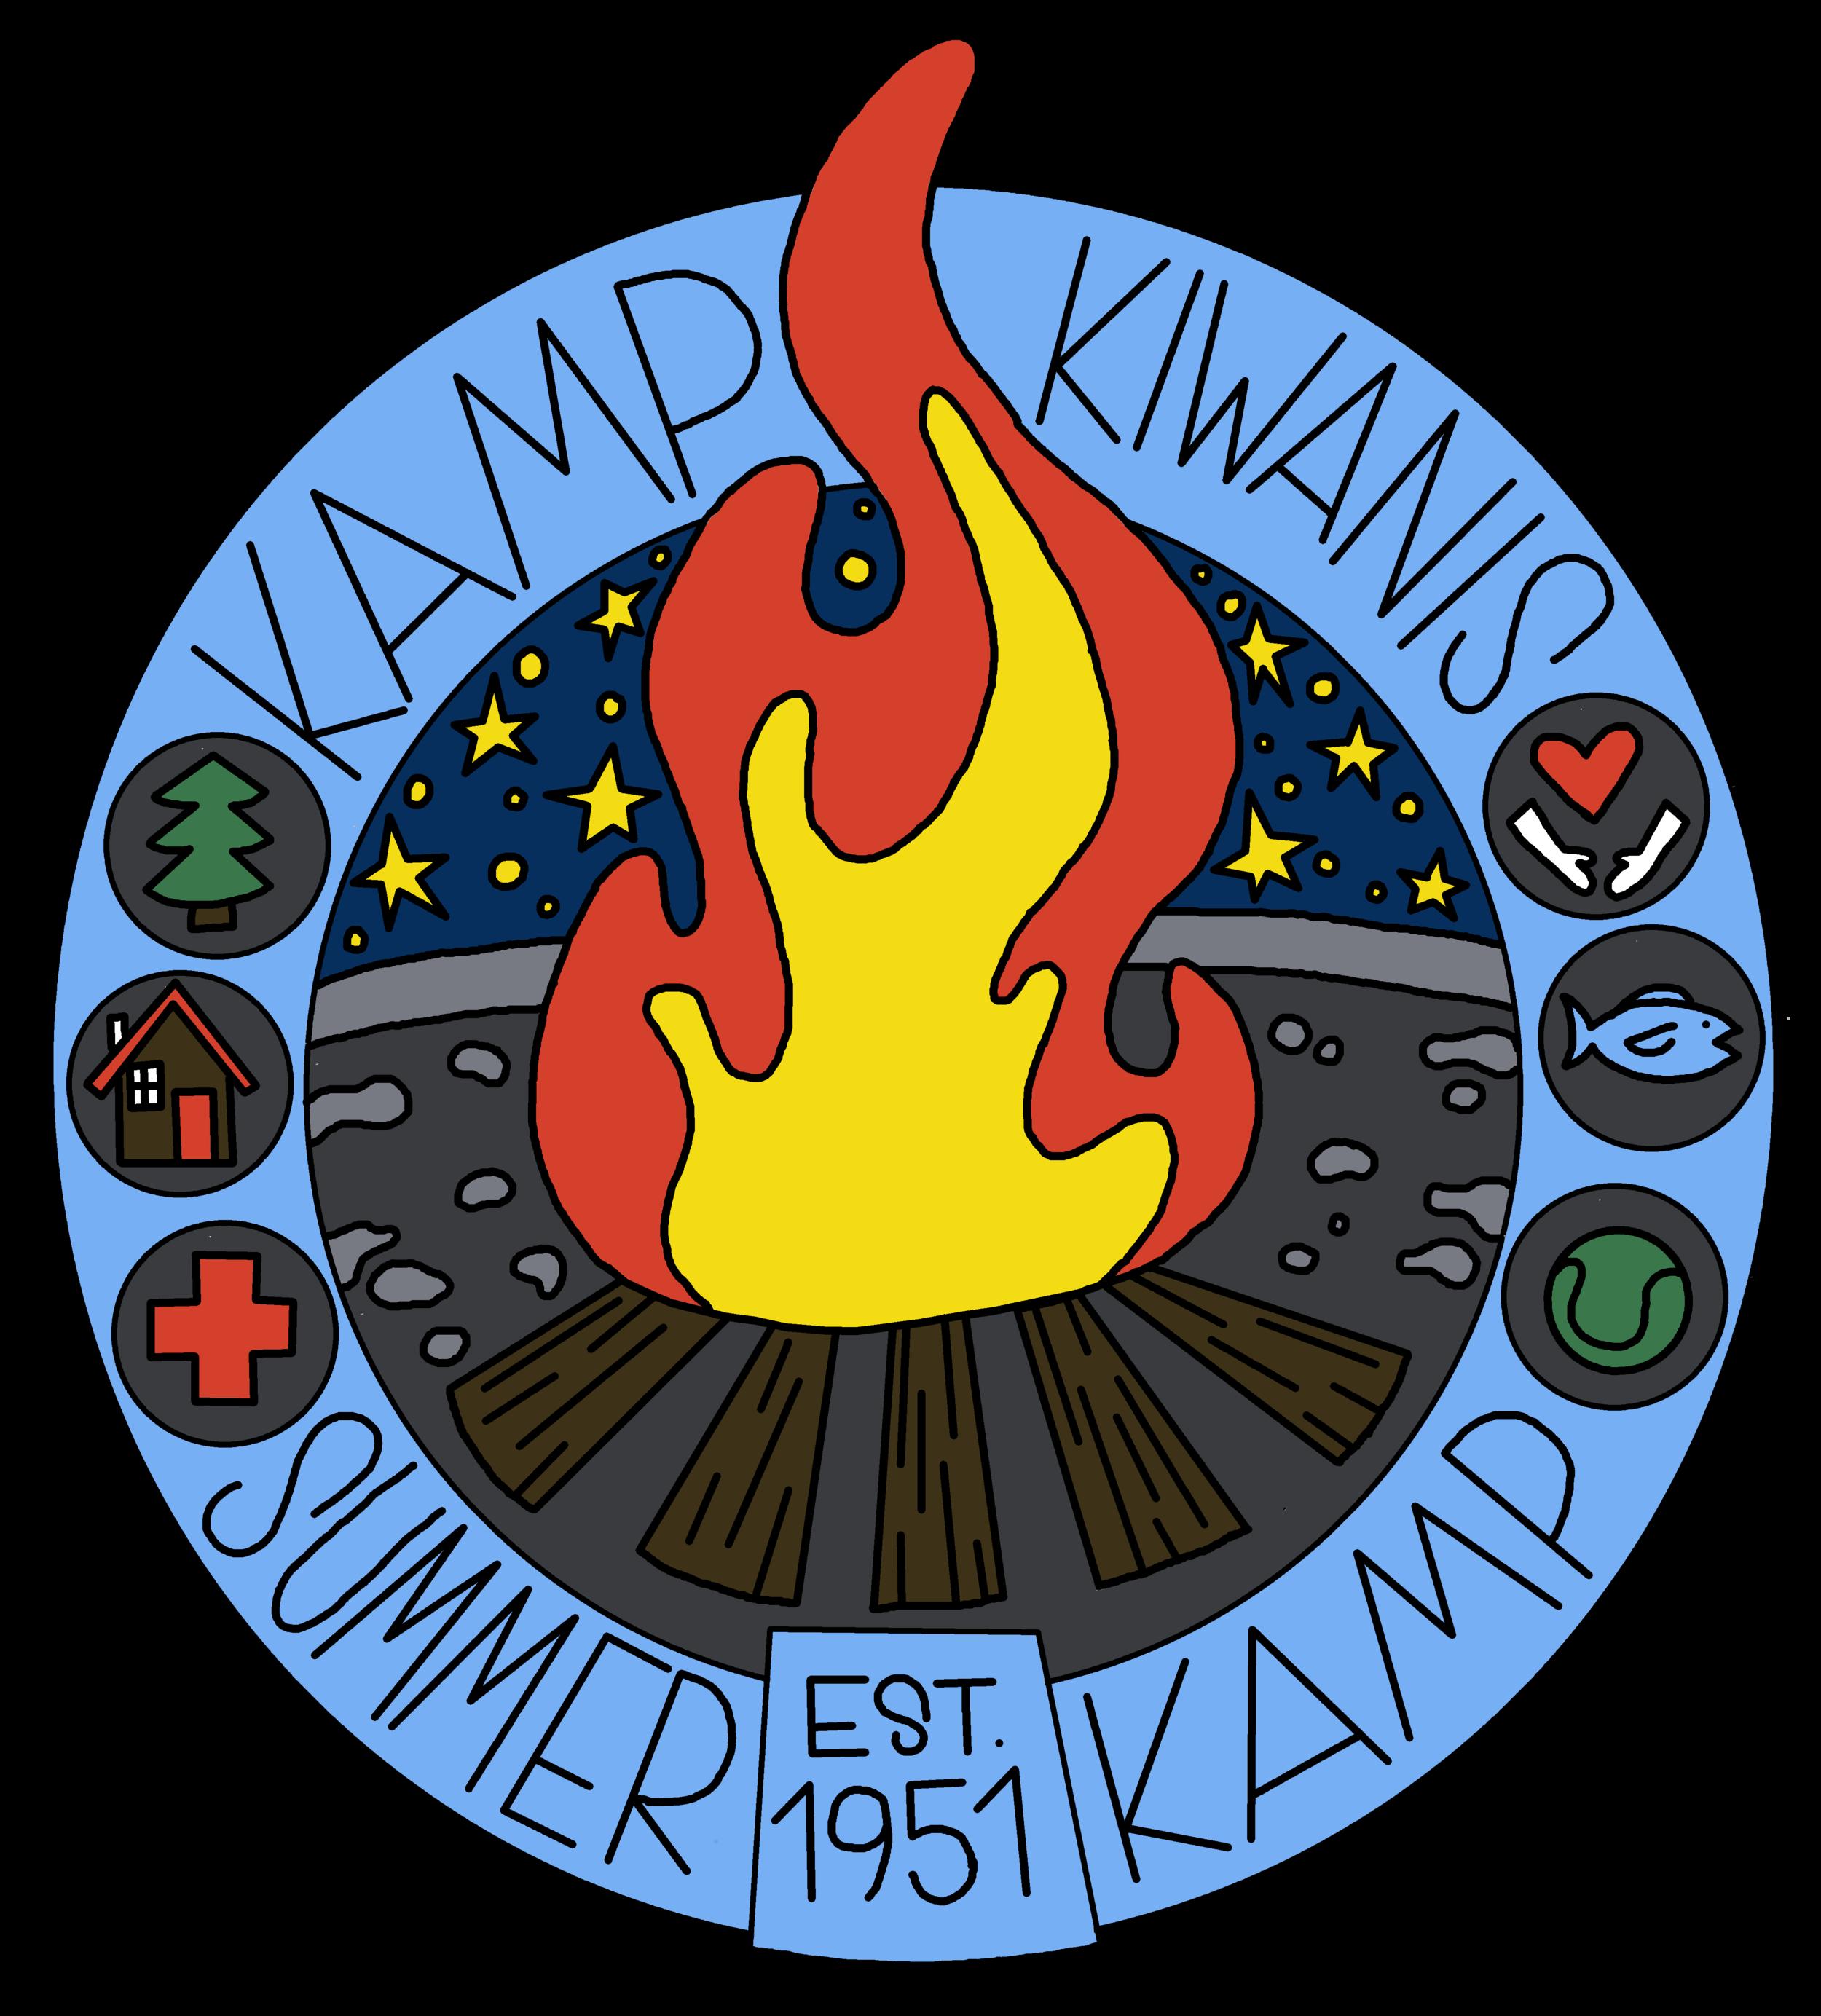 KK-summerKampCOLOURLOGO.png